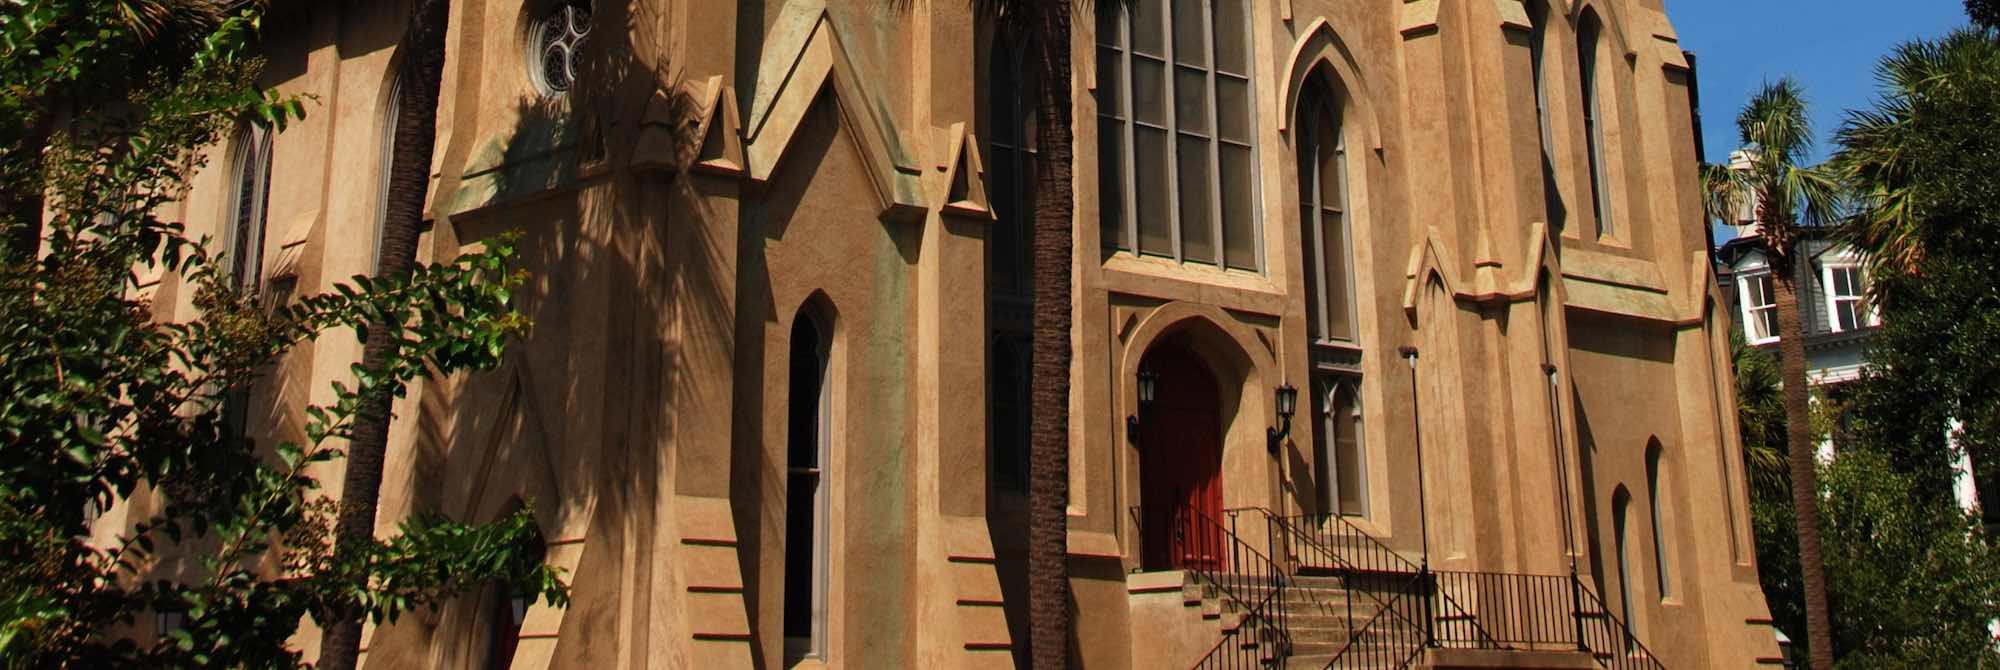 Entrance of Wesley Monumental United Methodist Church, on Calhoun Square, Savannah, GA.